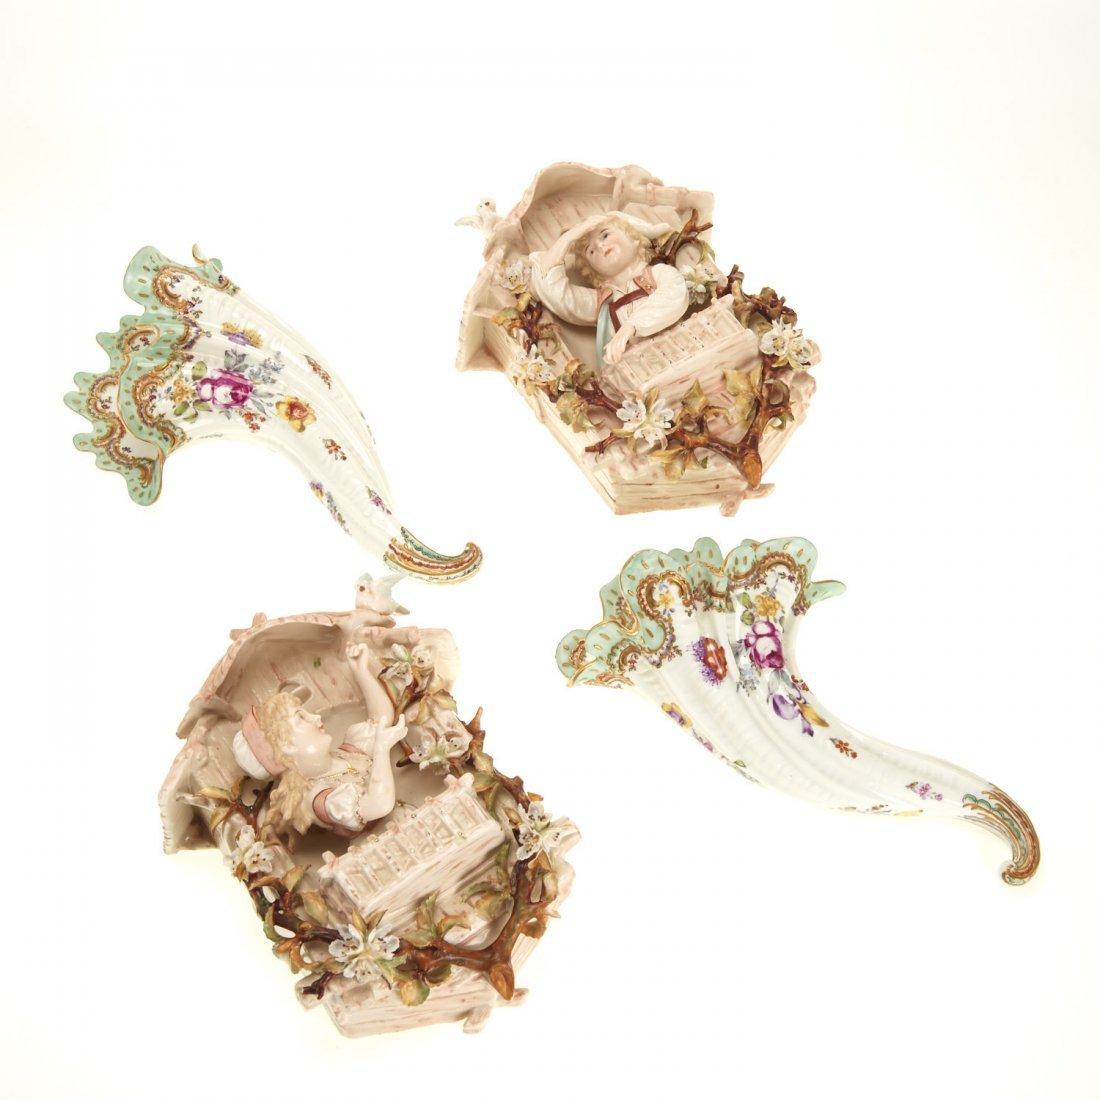 (2) Pr Antique Continental porcelain wall pockets